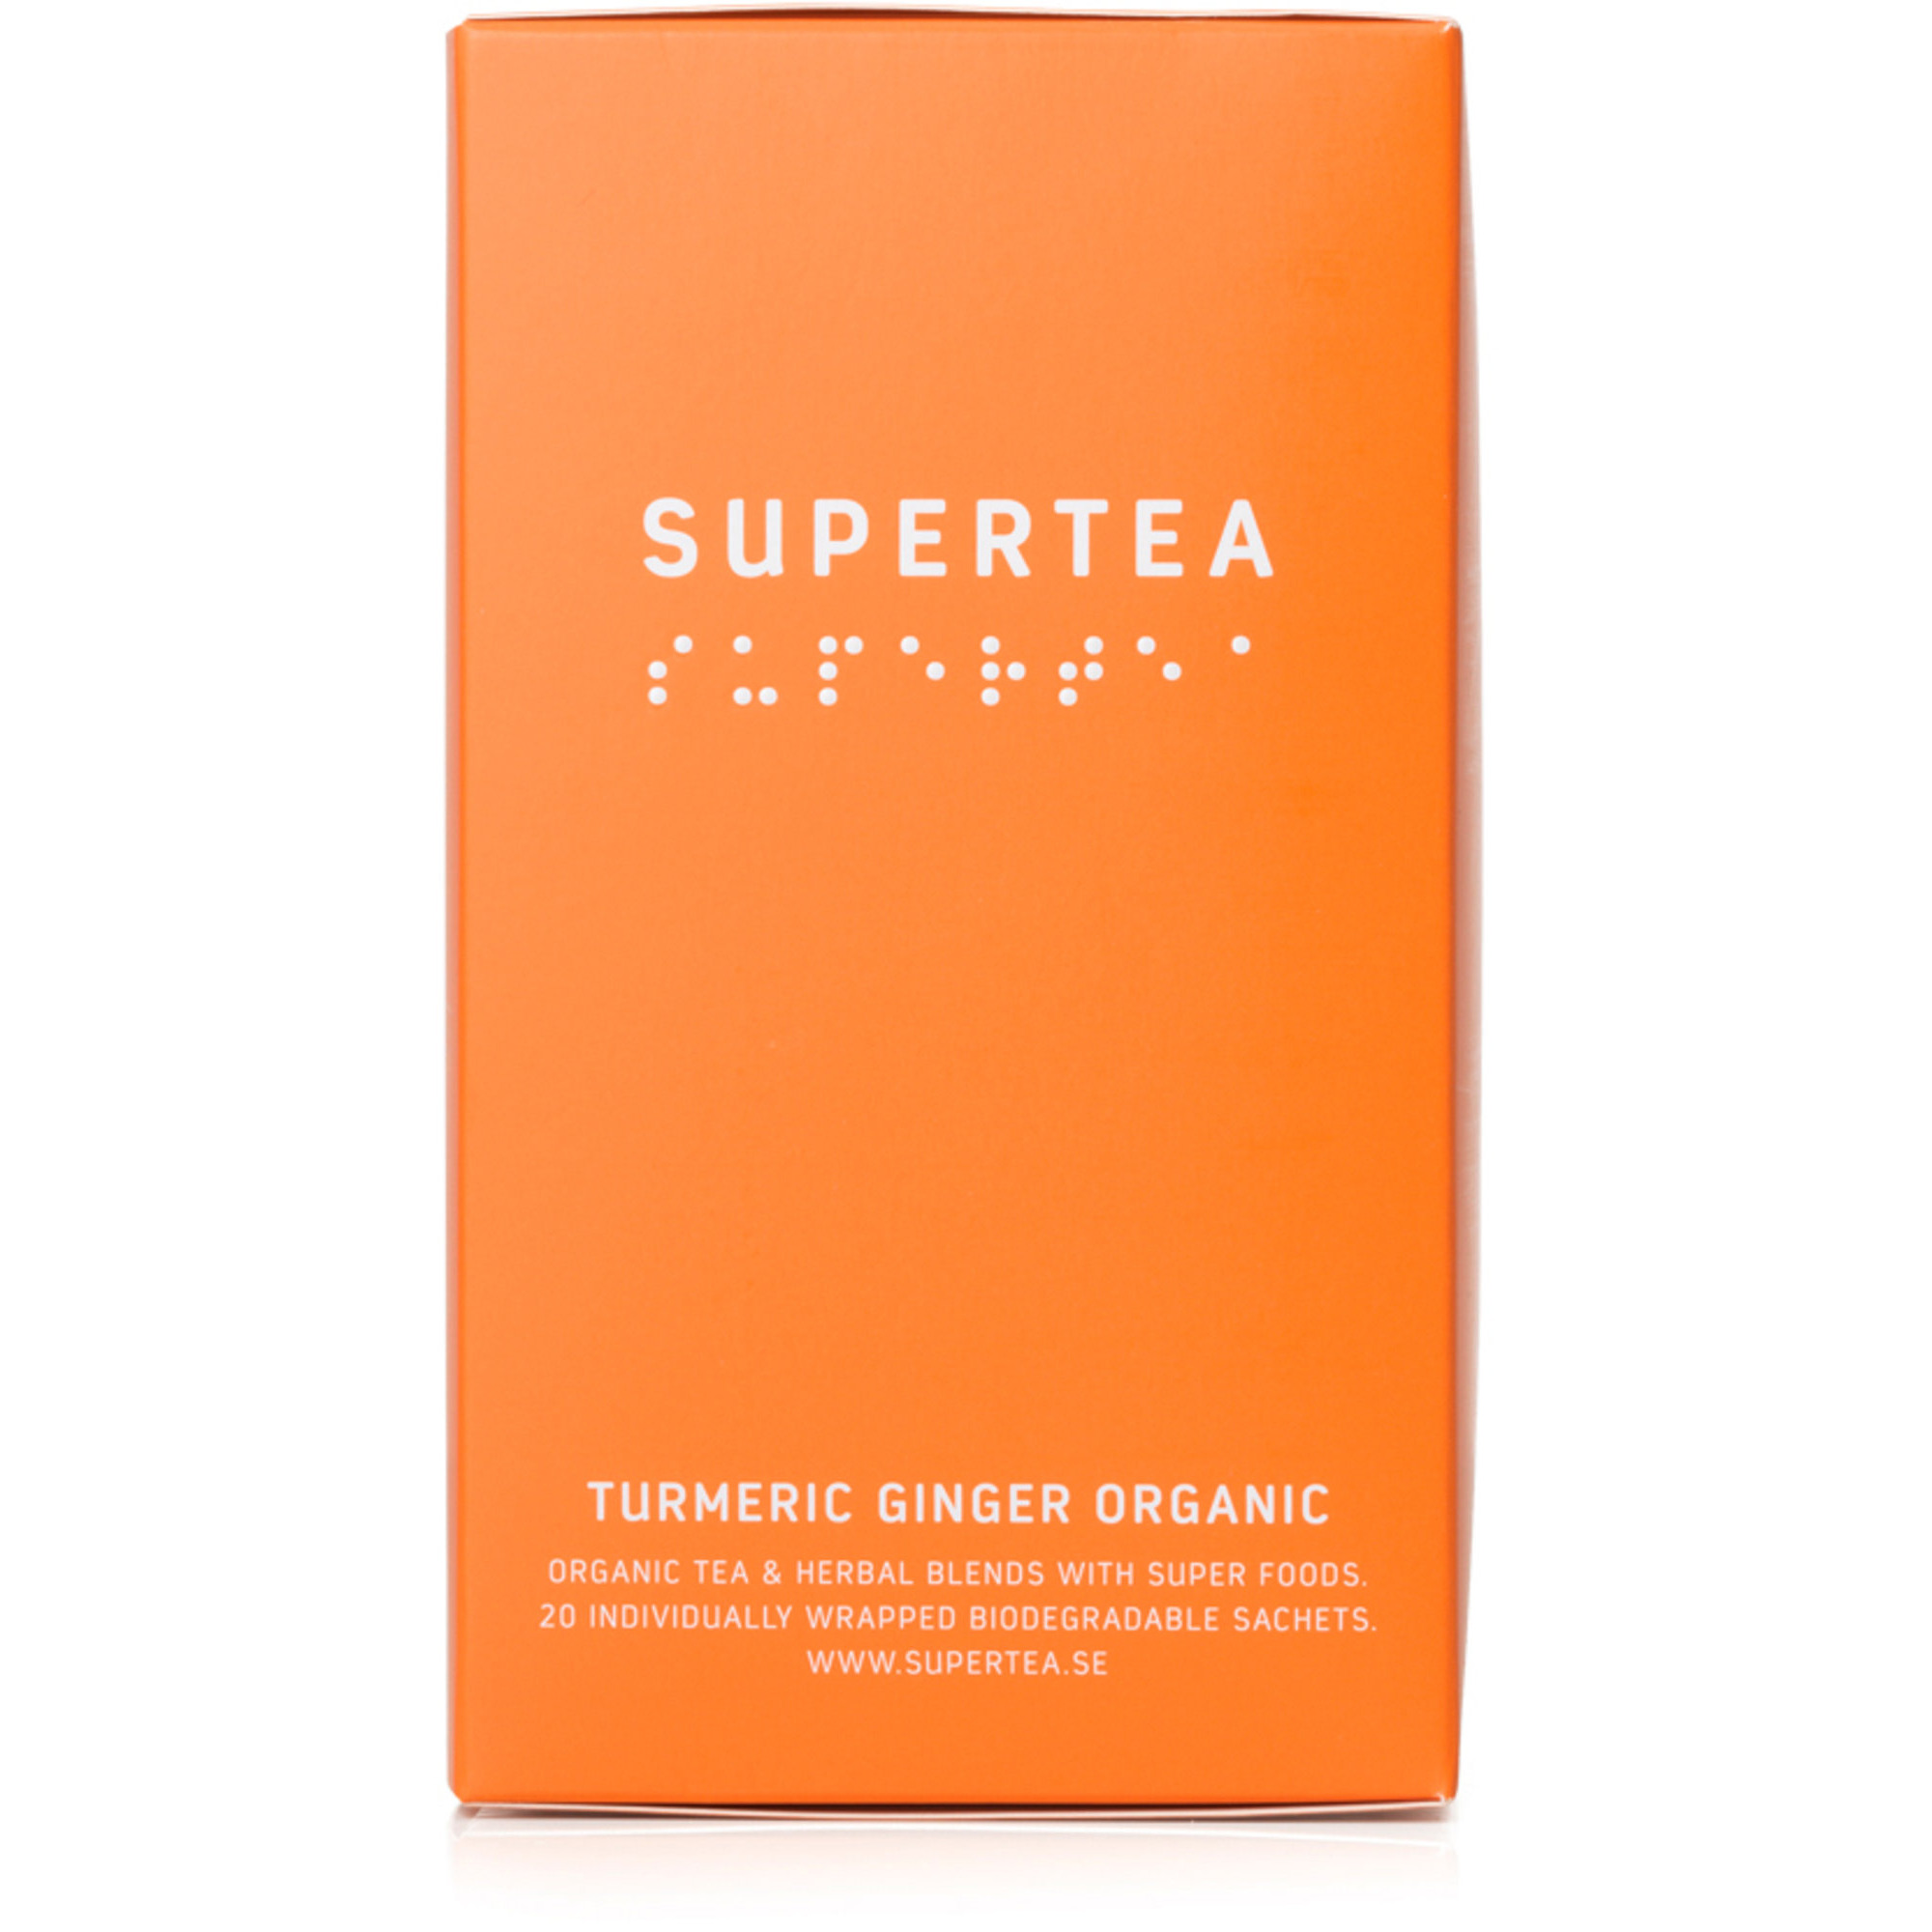 Teministeriet Supertea Turmeric Ginger Organic te